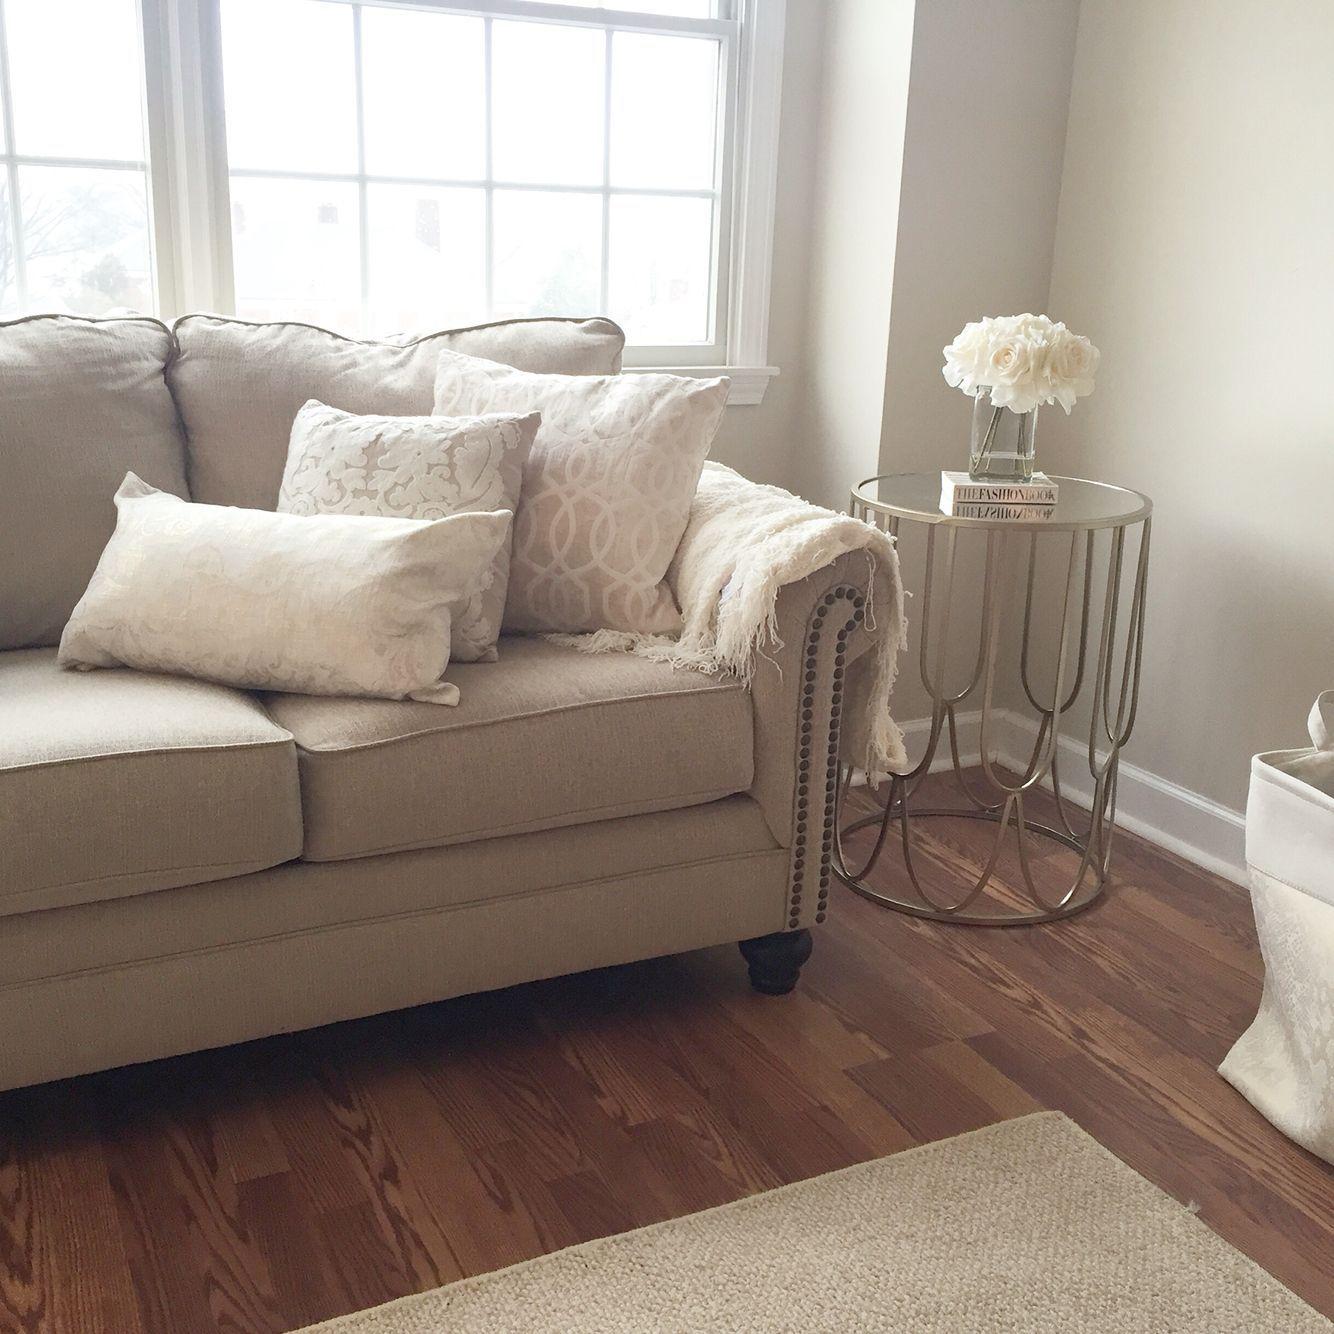 Cozy Living Room Warm Beige And Whites Paint Color Calico Cream Sherwin Williams Milari Sofa In Cr Beige Couch Living Room Living Room Warm Tan Living Room